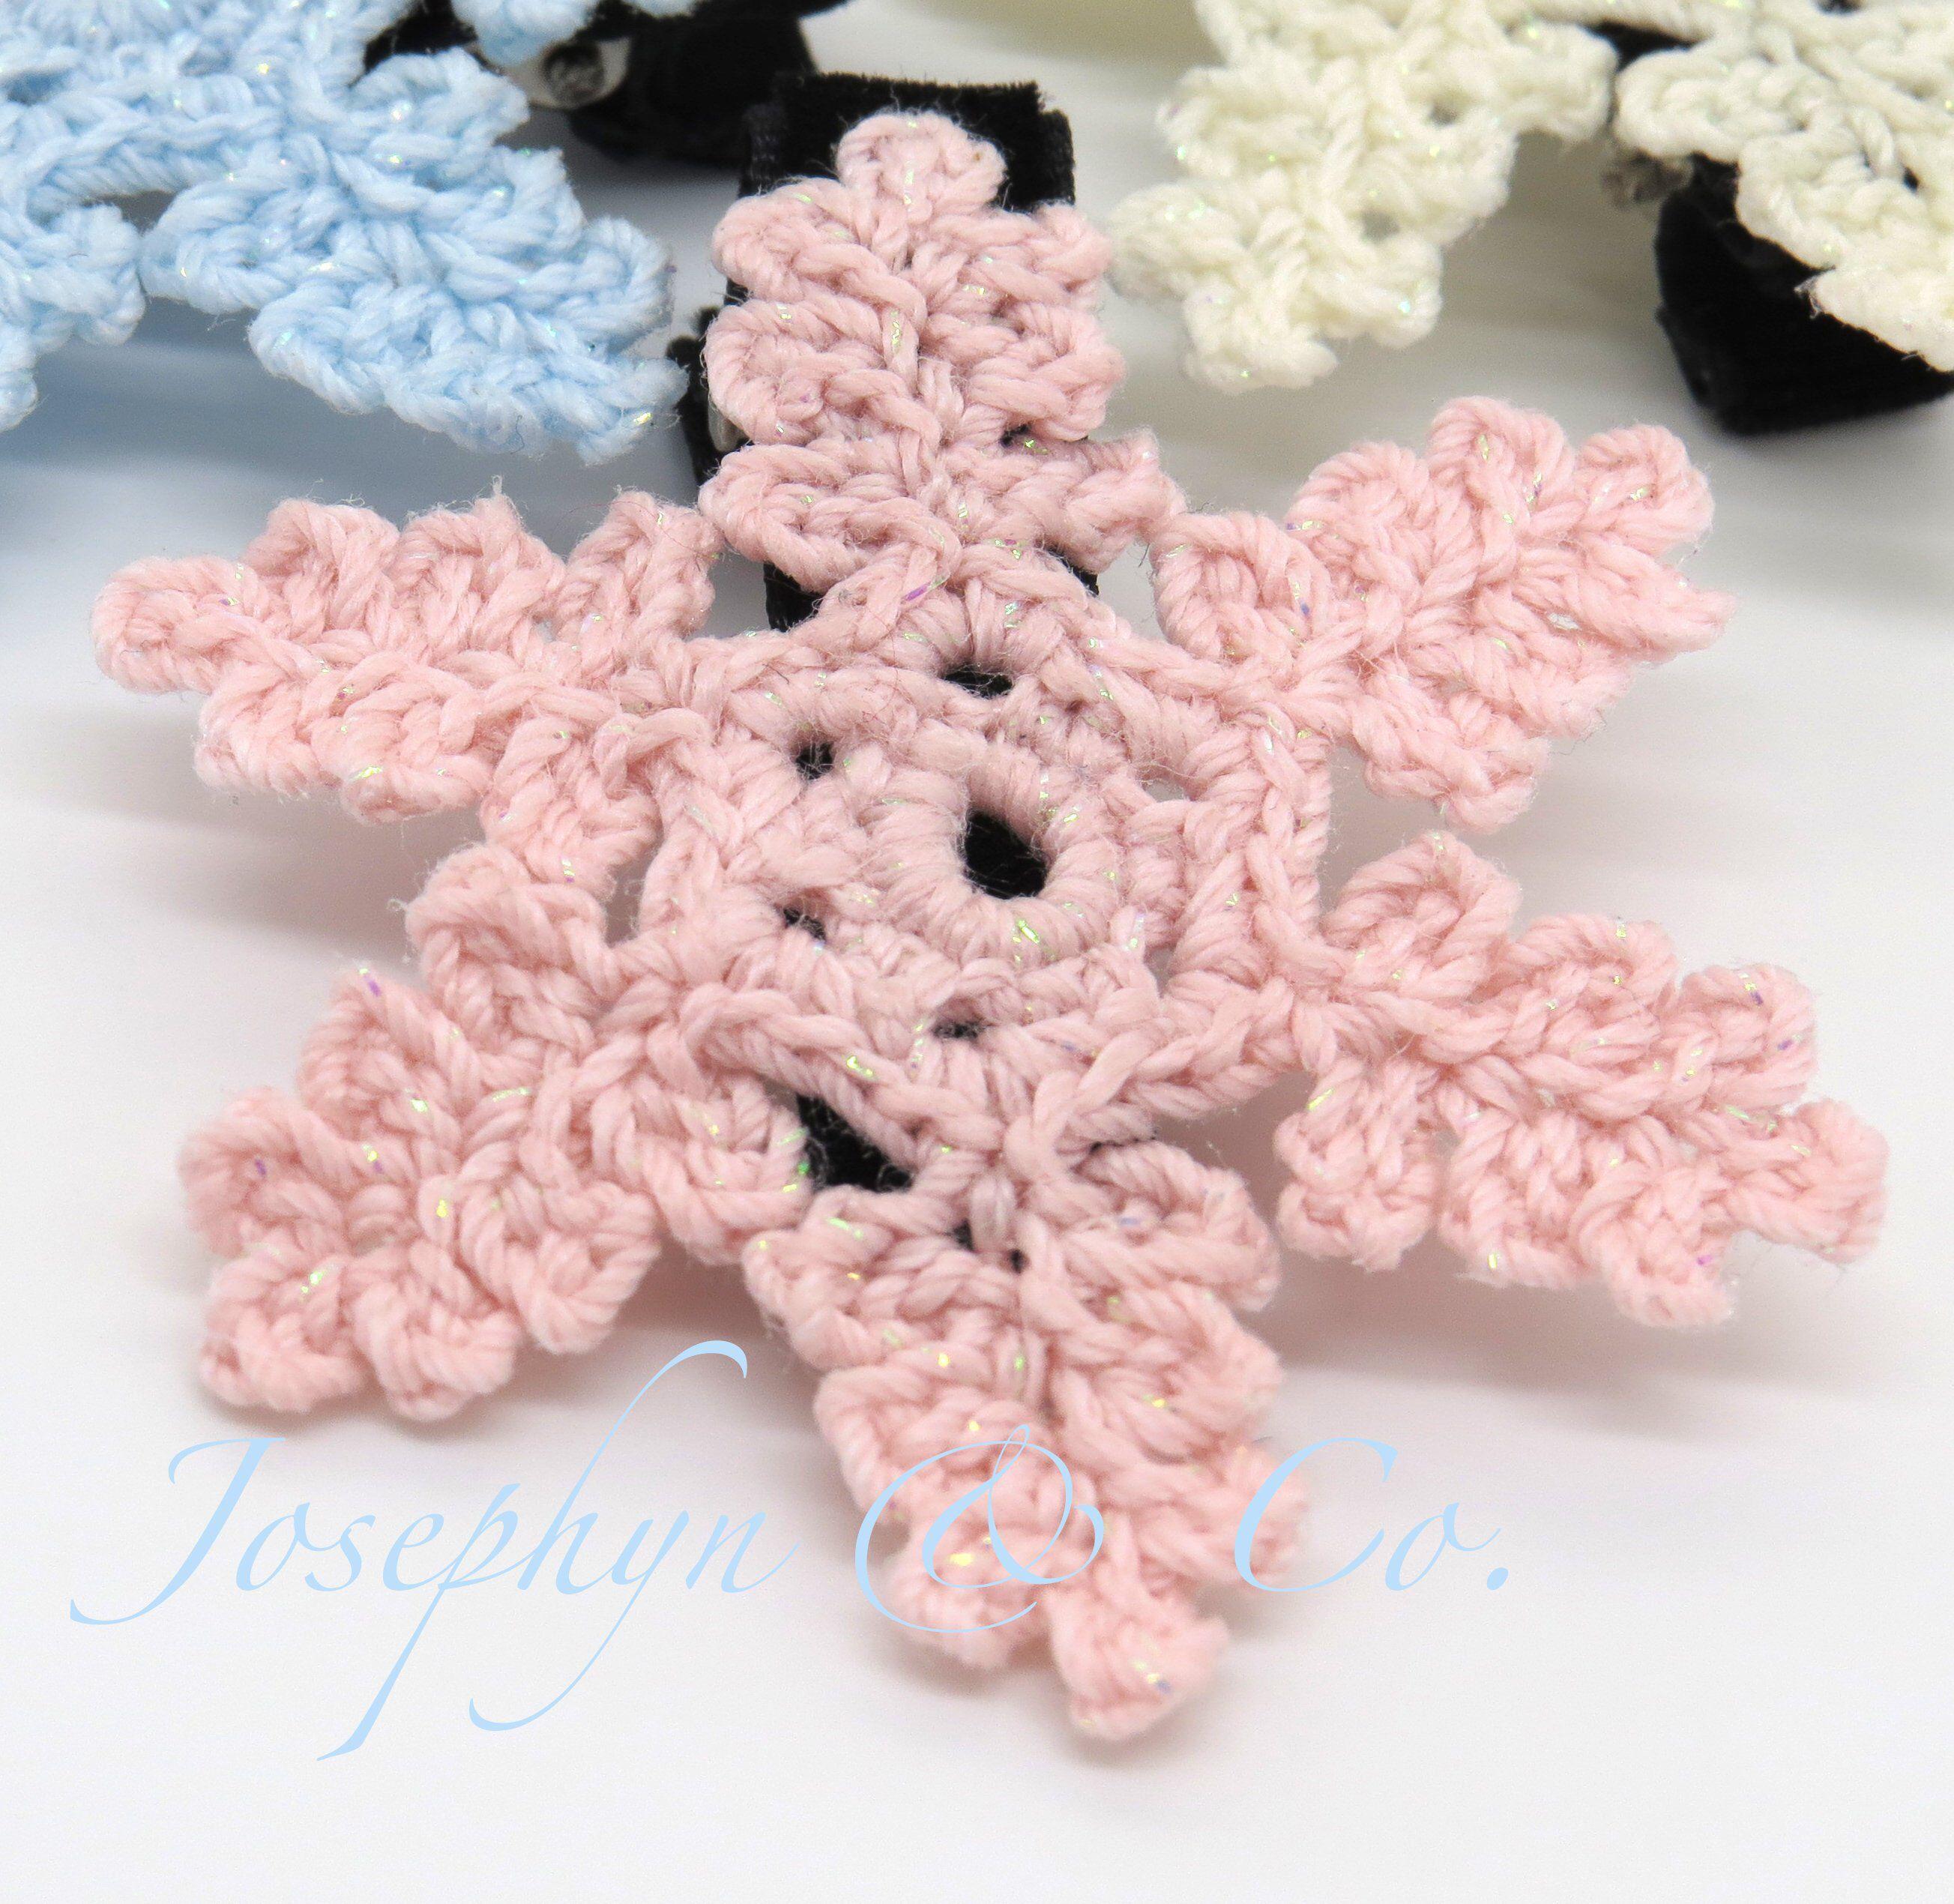 Crochet pink lace snowflake alligator clip small diy